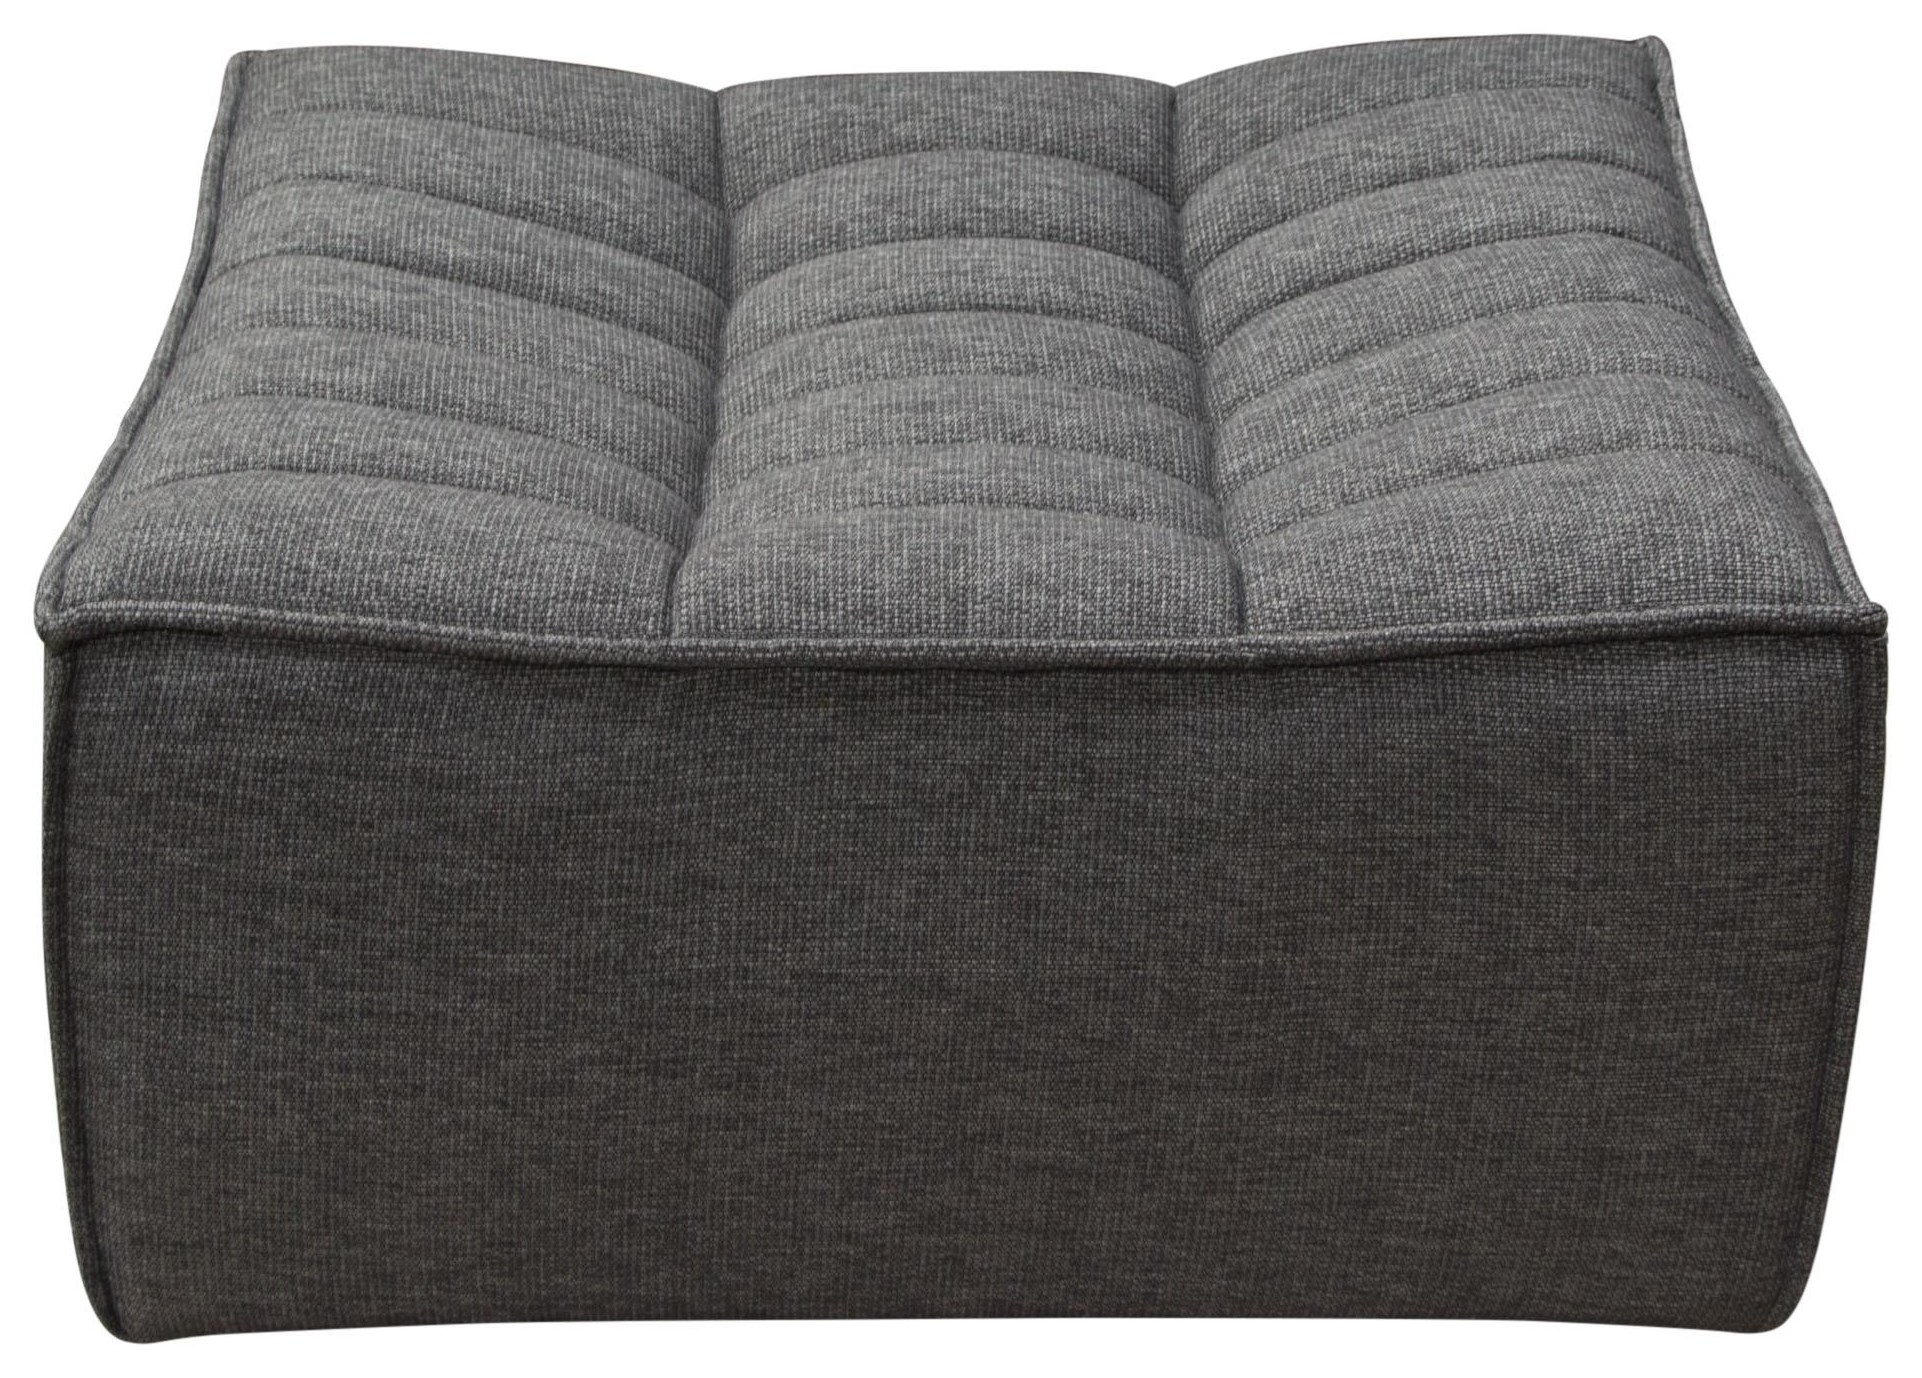 Marshall Ottoman by Diamond Sofa at HomeWorld Furniture